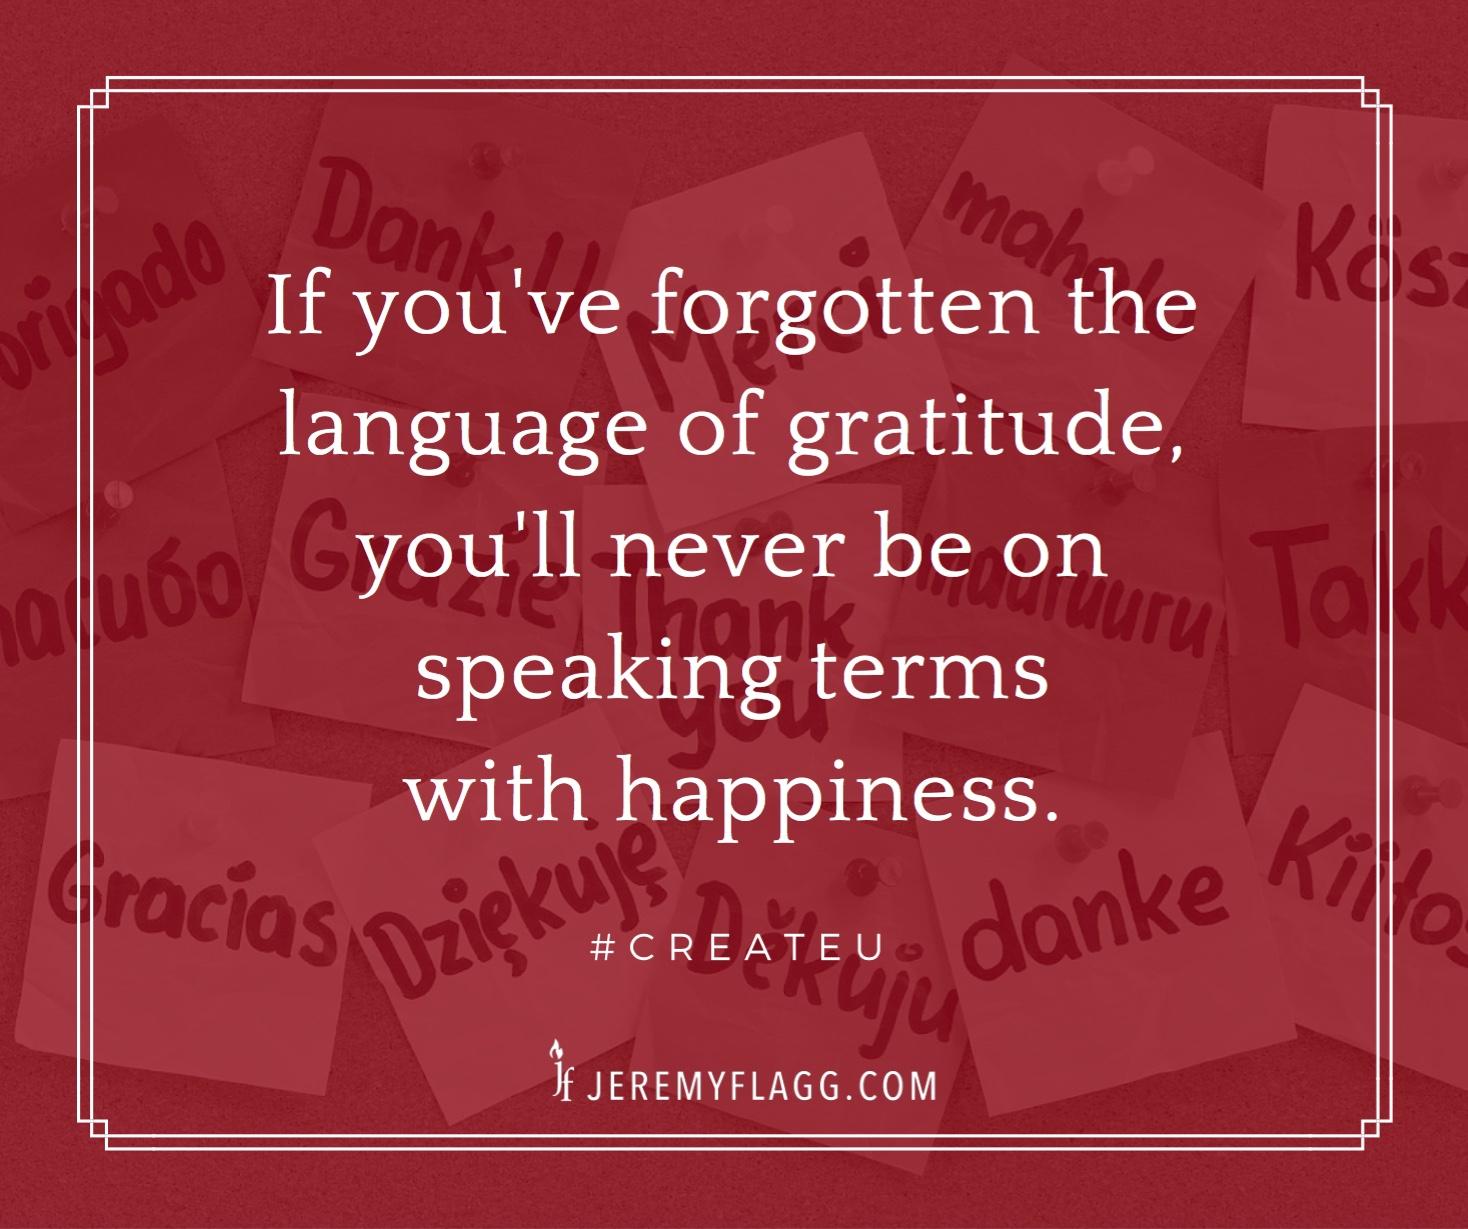 Language-of-gratitude-quote-Jeremy-Flagg-FB